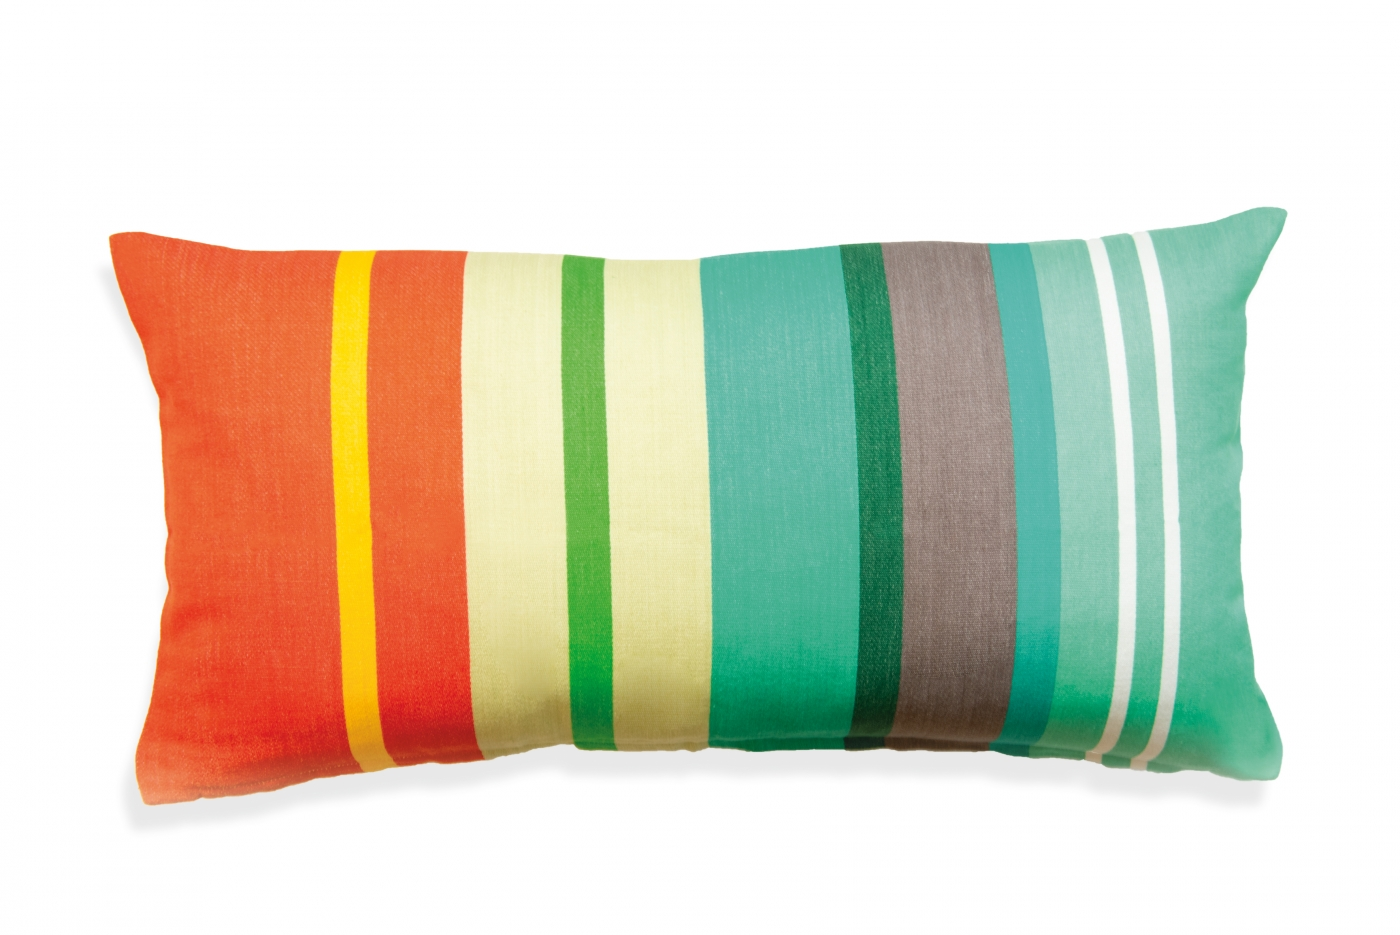 Dekorativní polštář Peach, 60 cm